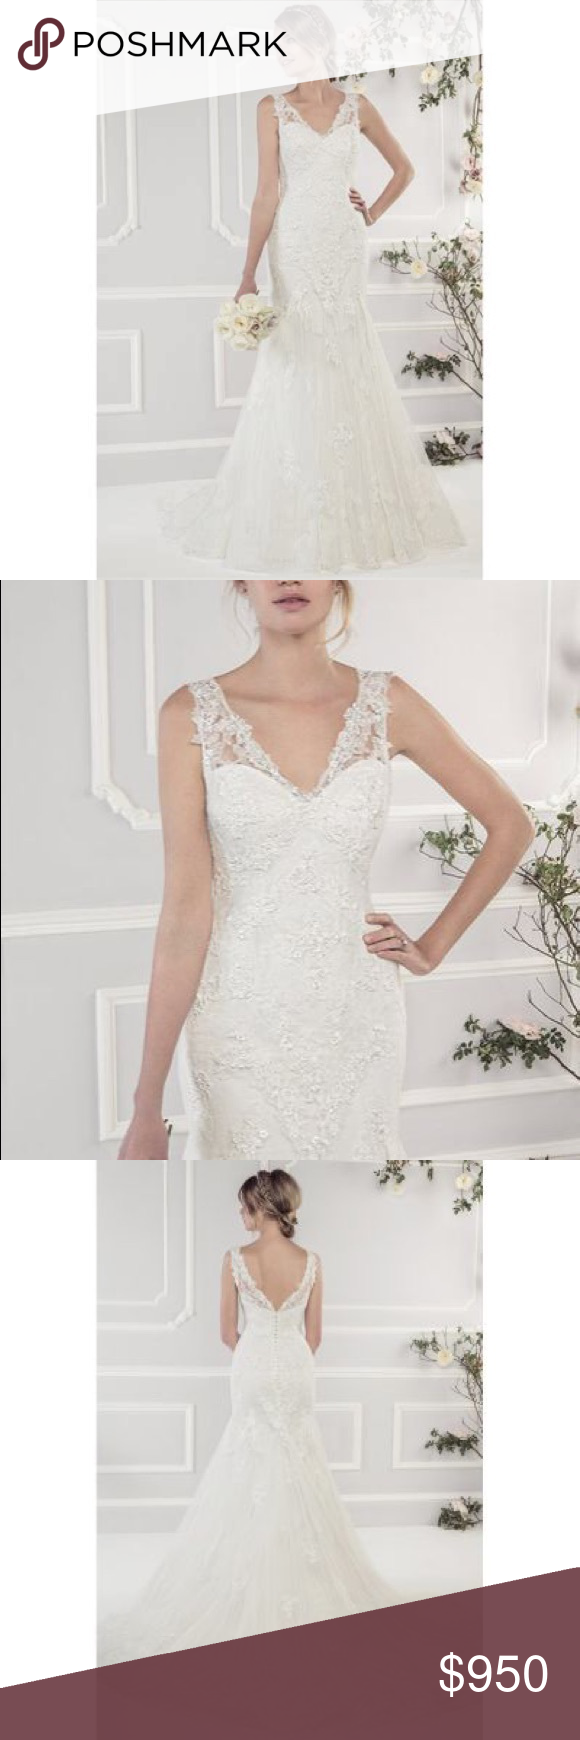 Ellis Bridals Beautiful Ivory Wedding Dress Ivory Wedding Dress Wedding Dresses Ellis Bridal